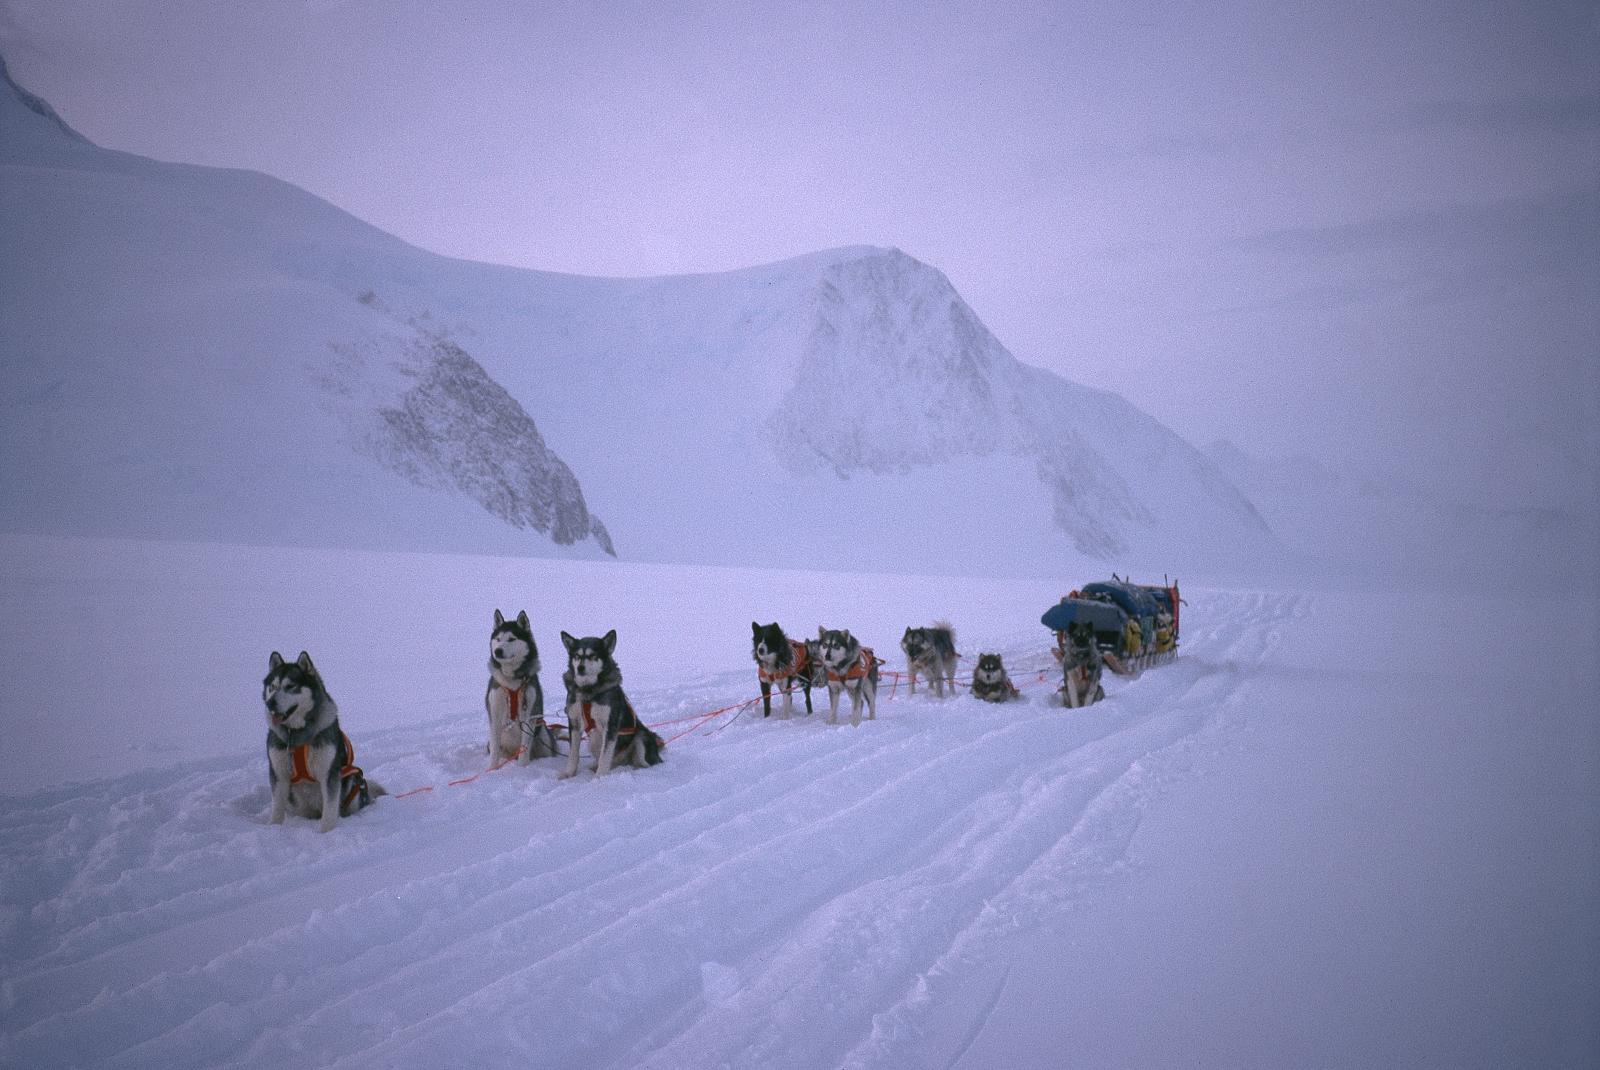 Trans-Antarctica dog sled team on the Antarctic Peninsula. Photo ©Will Steger